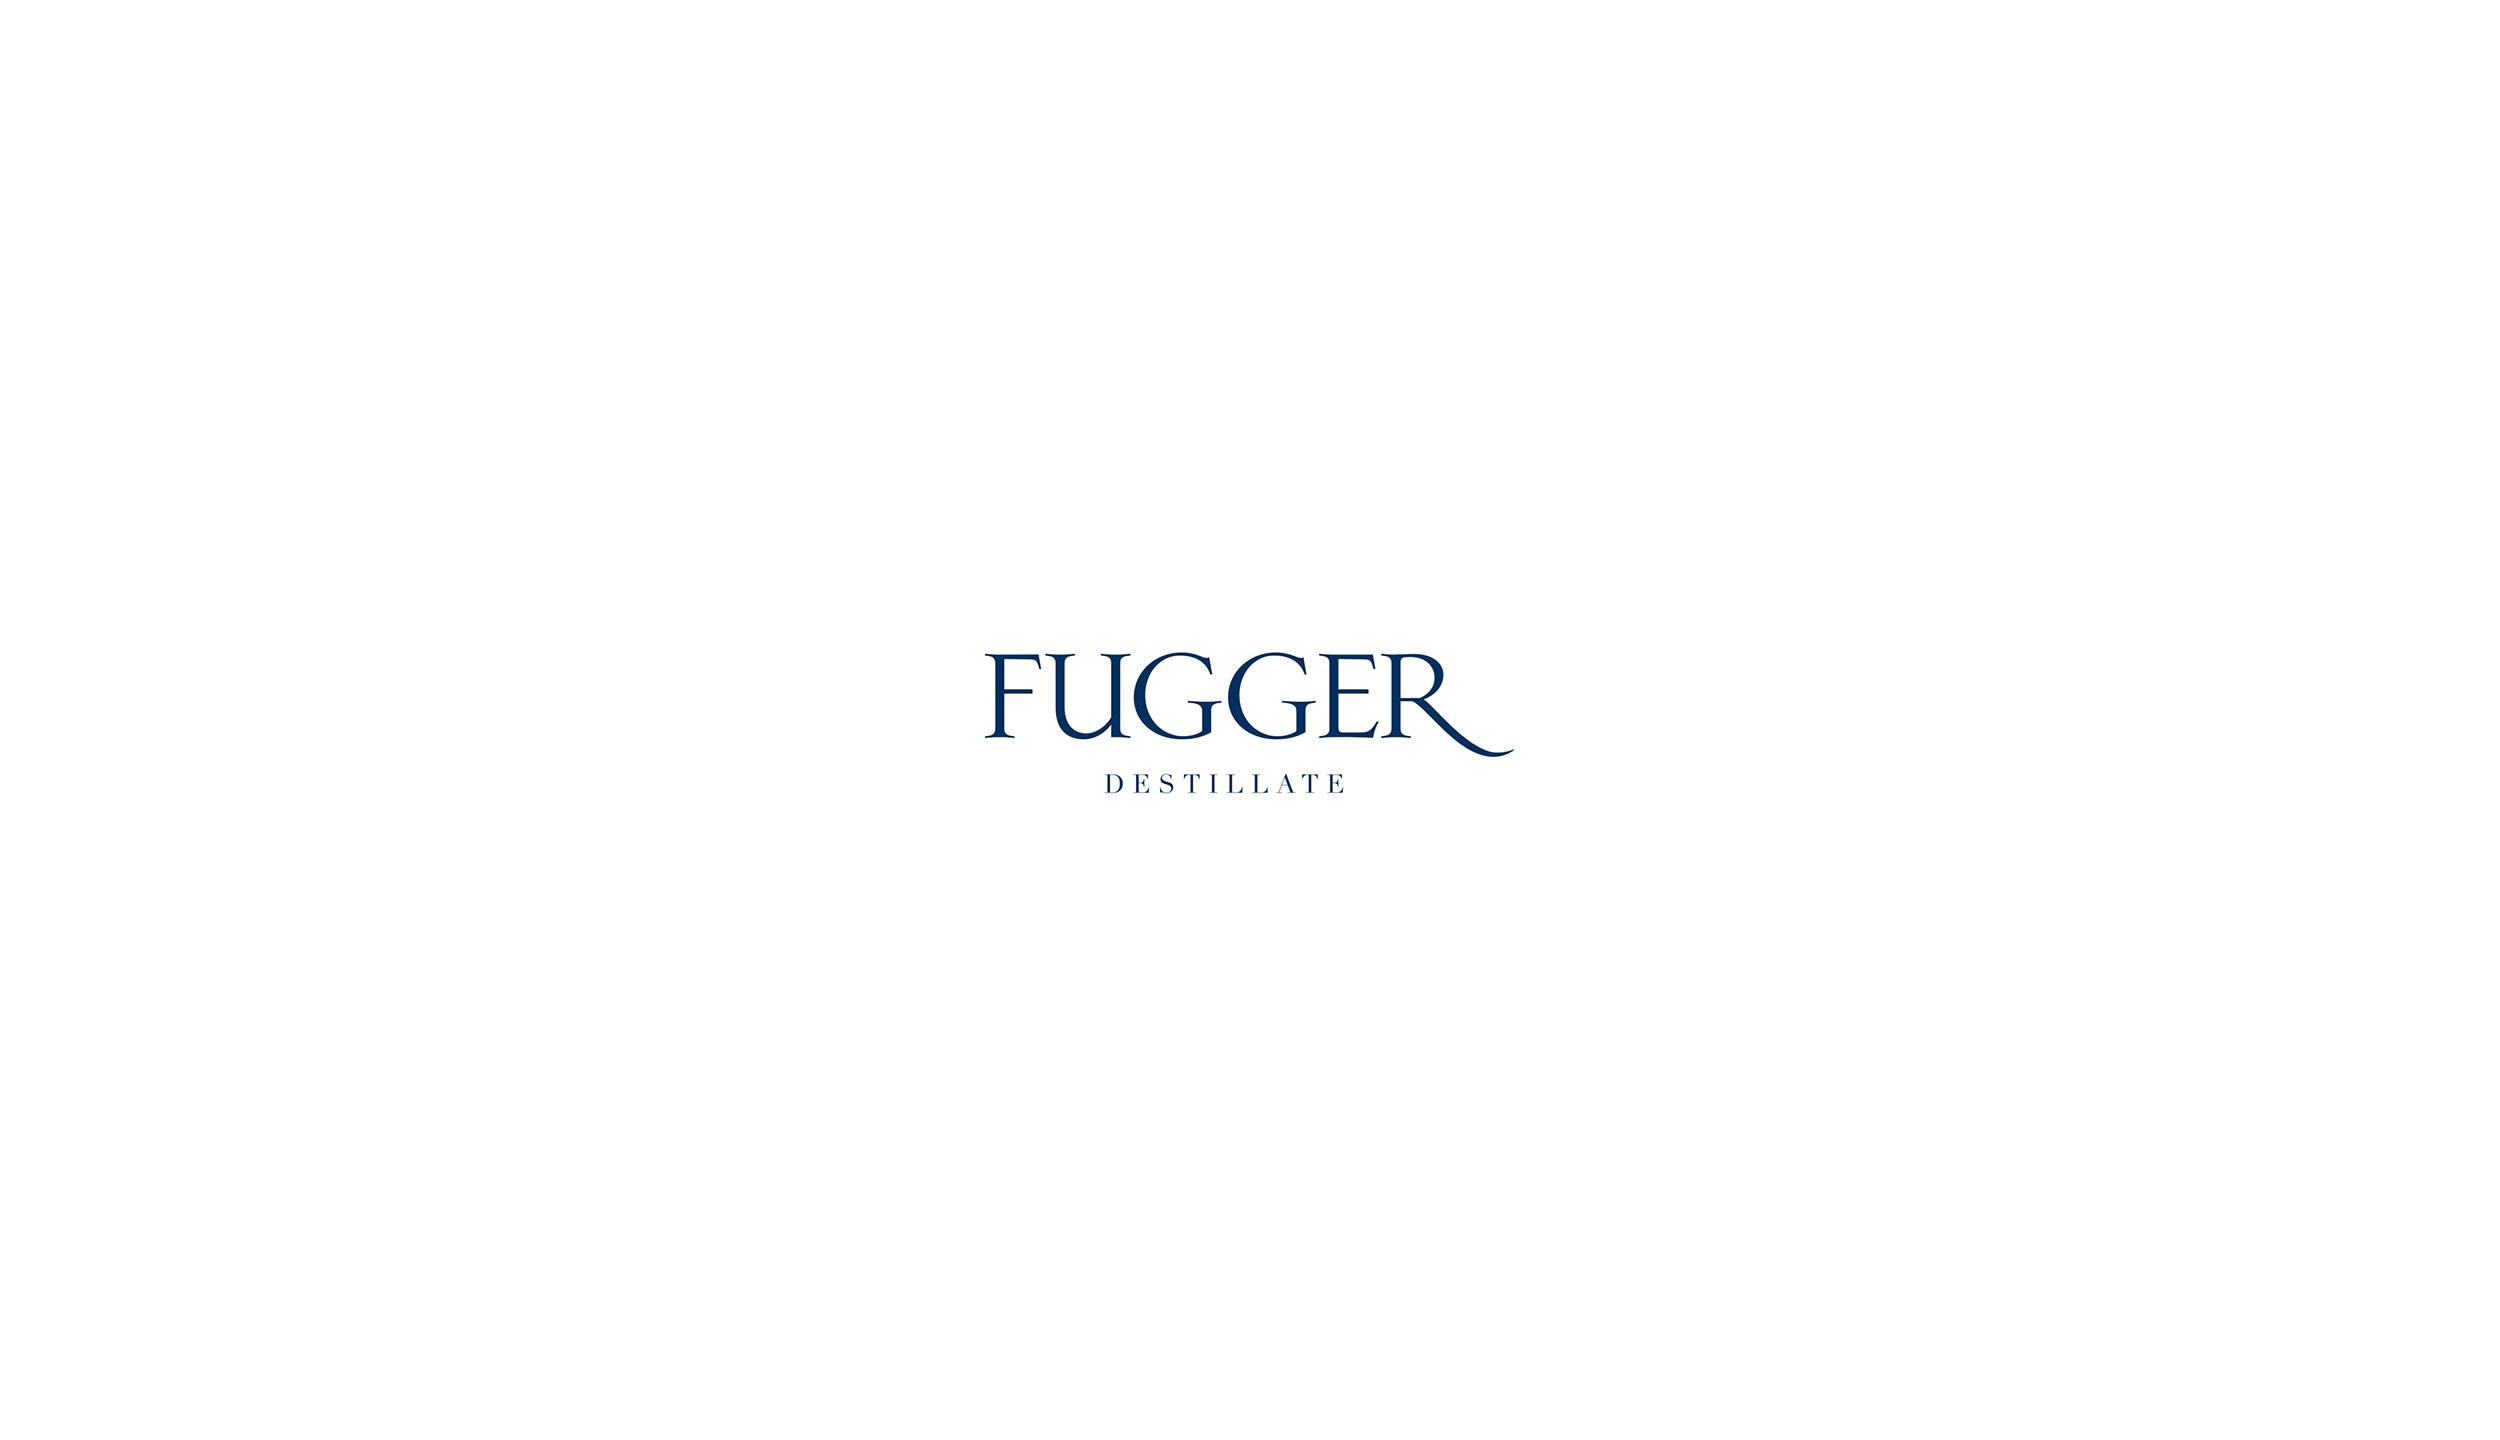 fugger destillate augsburg label design spirituosen blockundstift logo